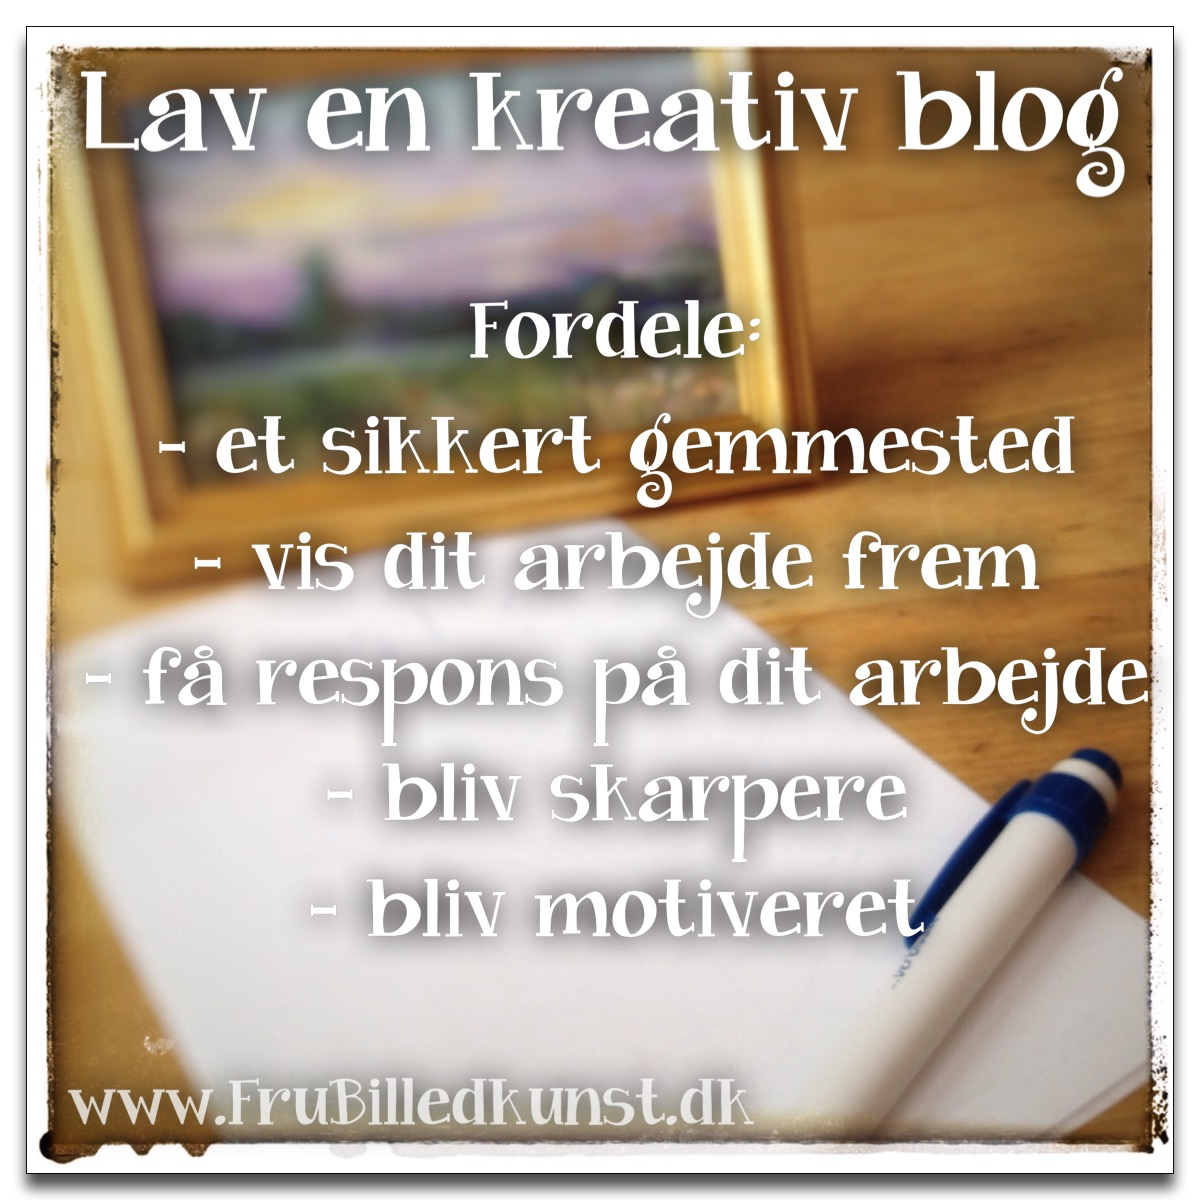 www.FruBilledkunst.dk - formålet med en blog